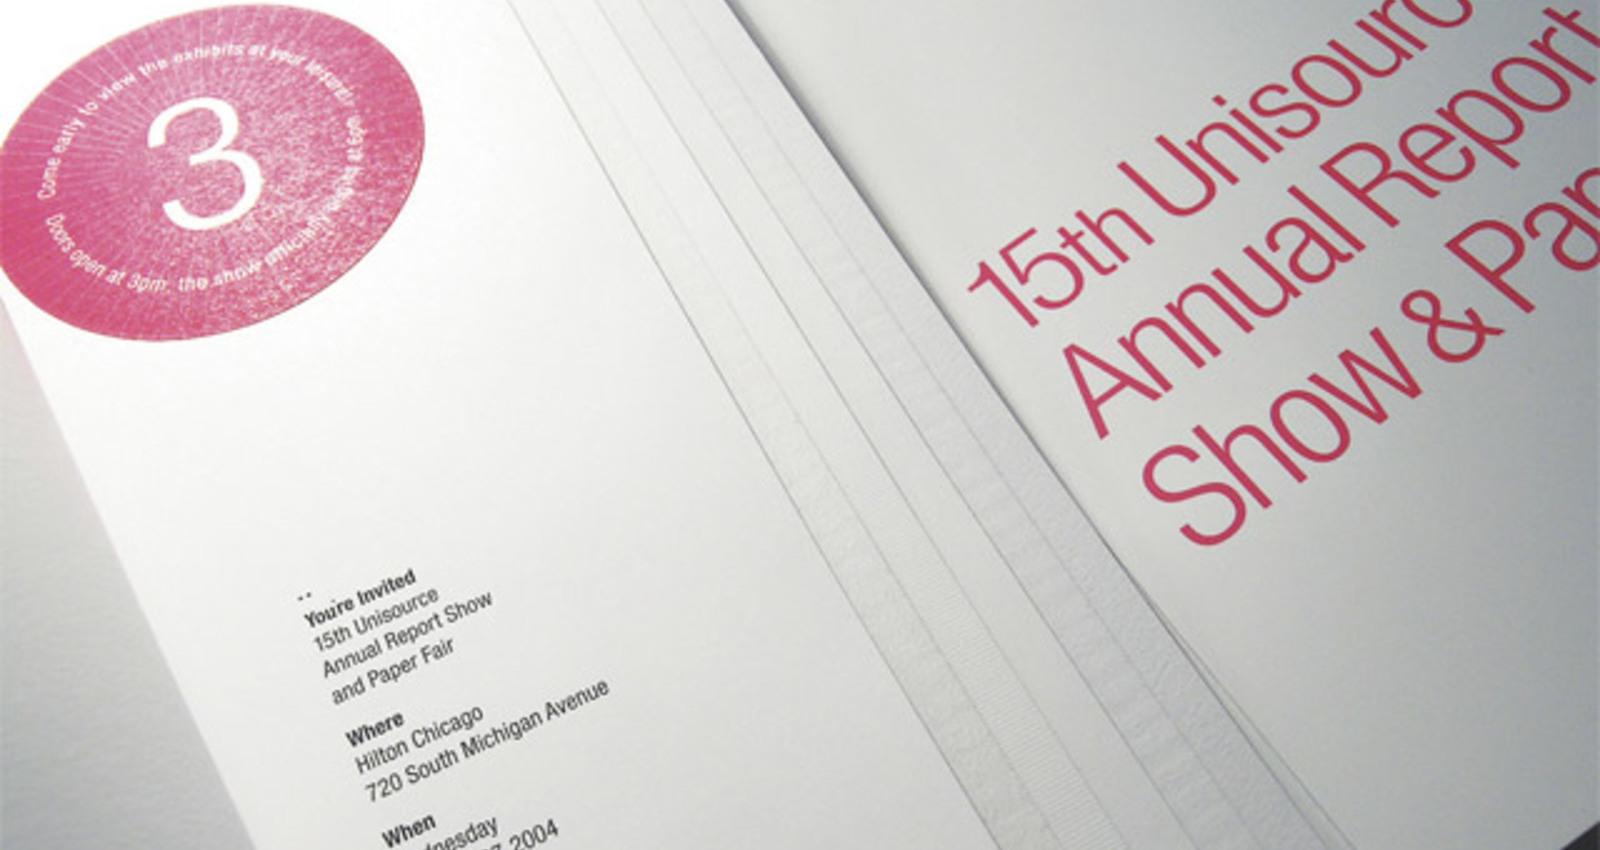 Unisource Show Invitation